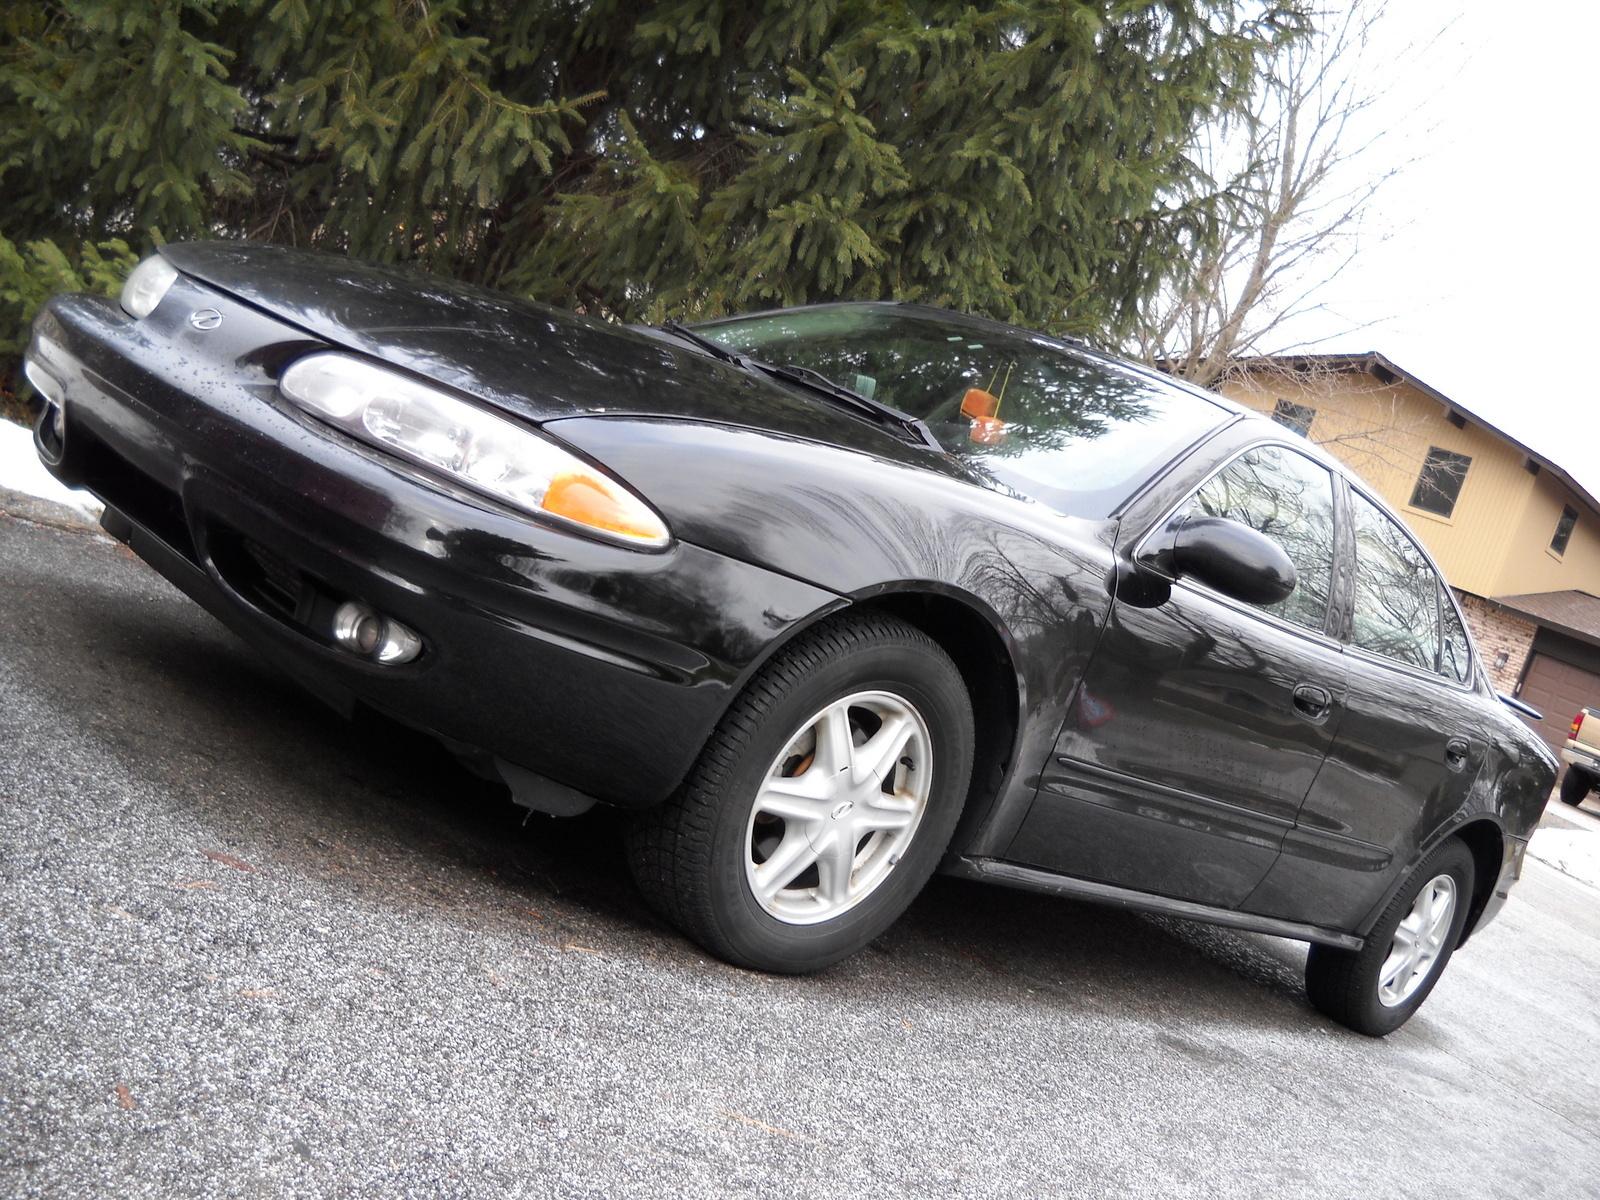 2002 Oldsmobile Alero - Overview